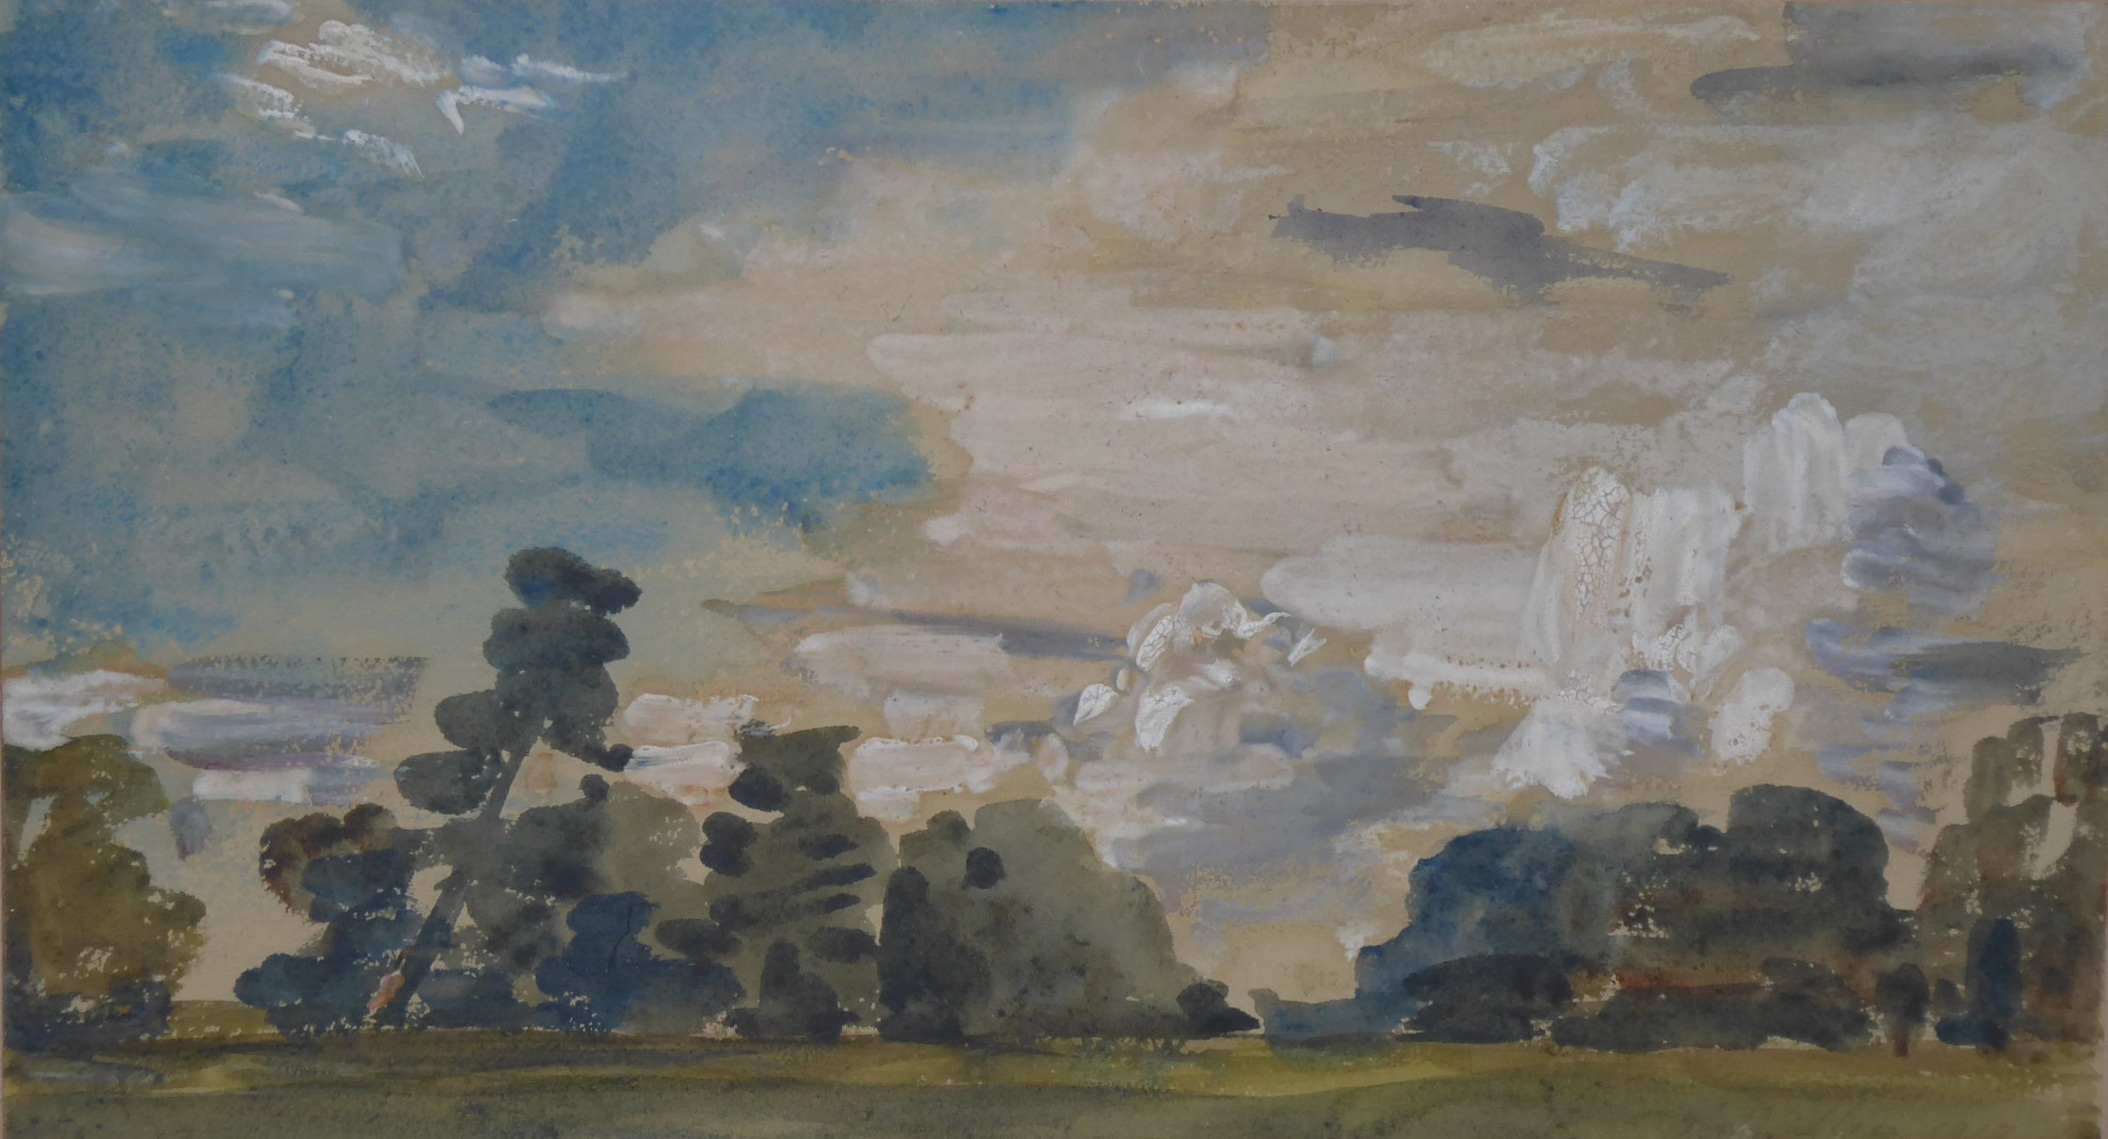 Philip Wilson Steer (1860 - 1942),   Trees and Sky,  1917, Watercolour, 19 x 34 cm